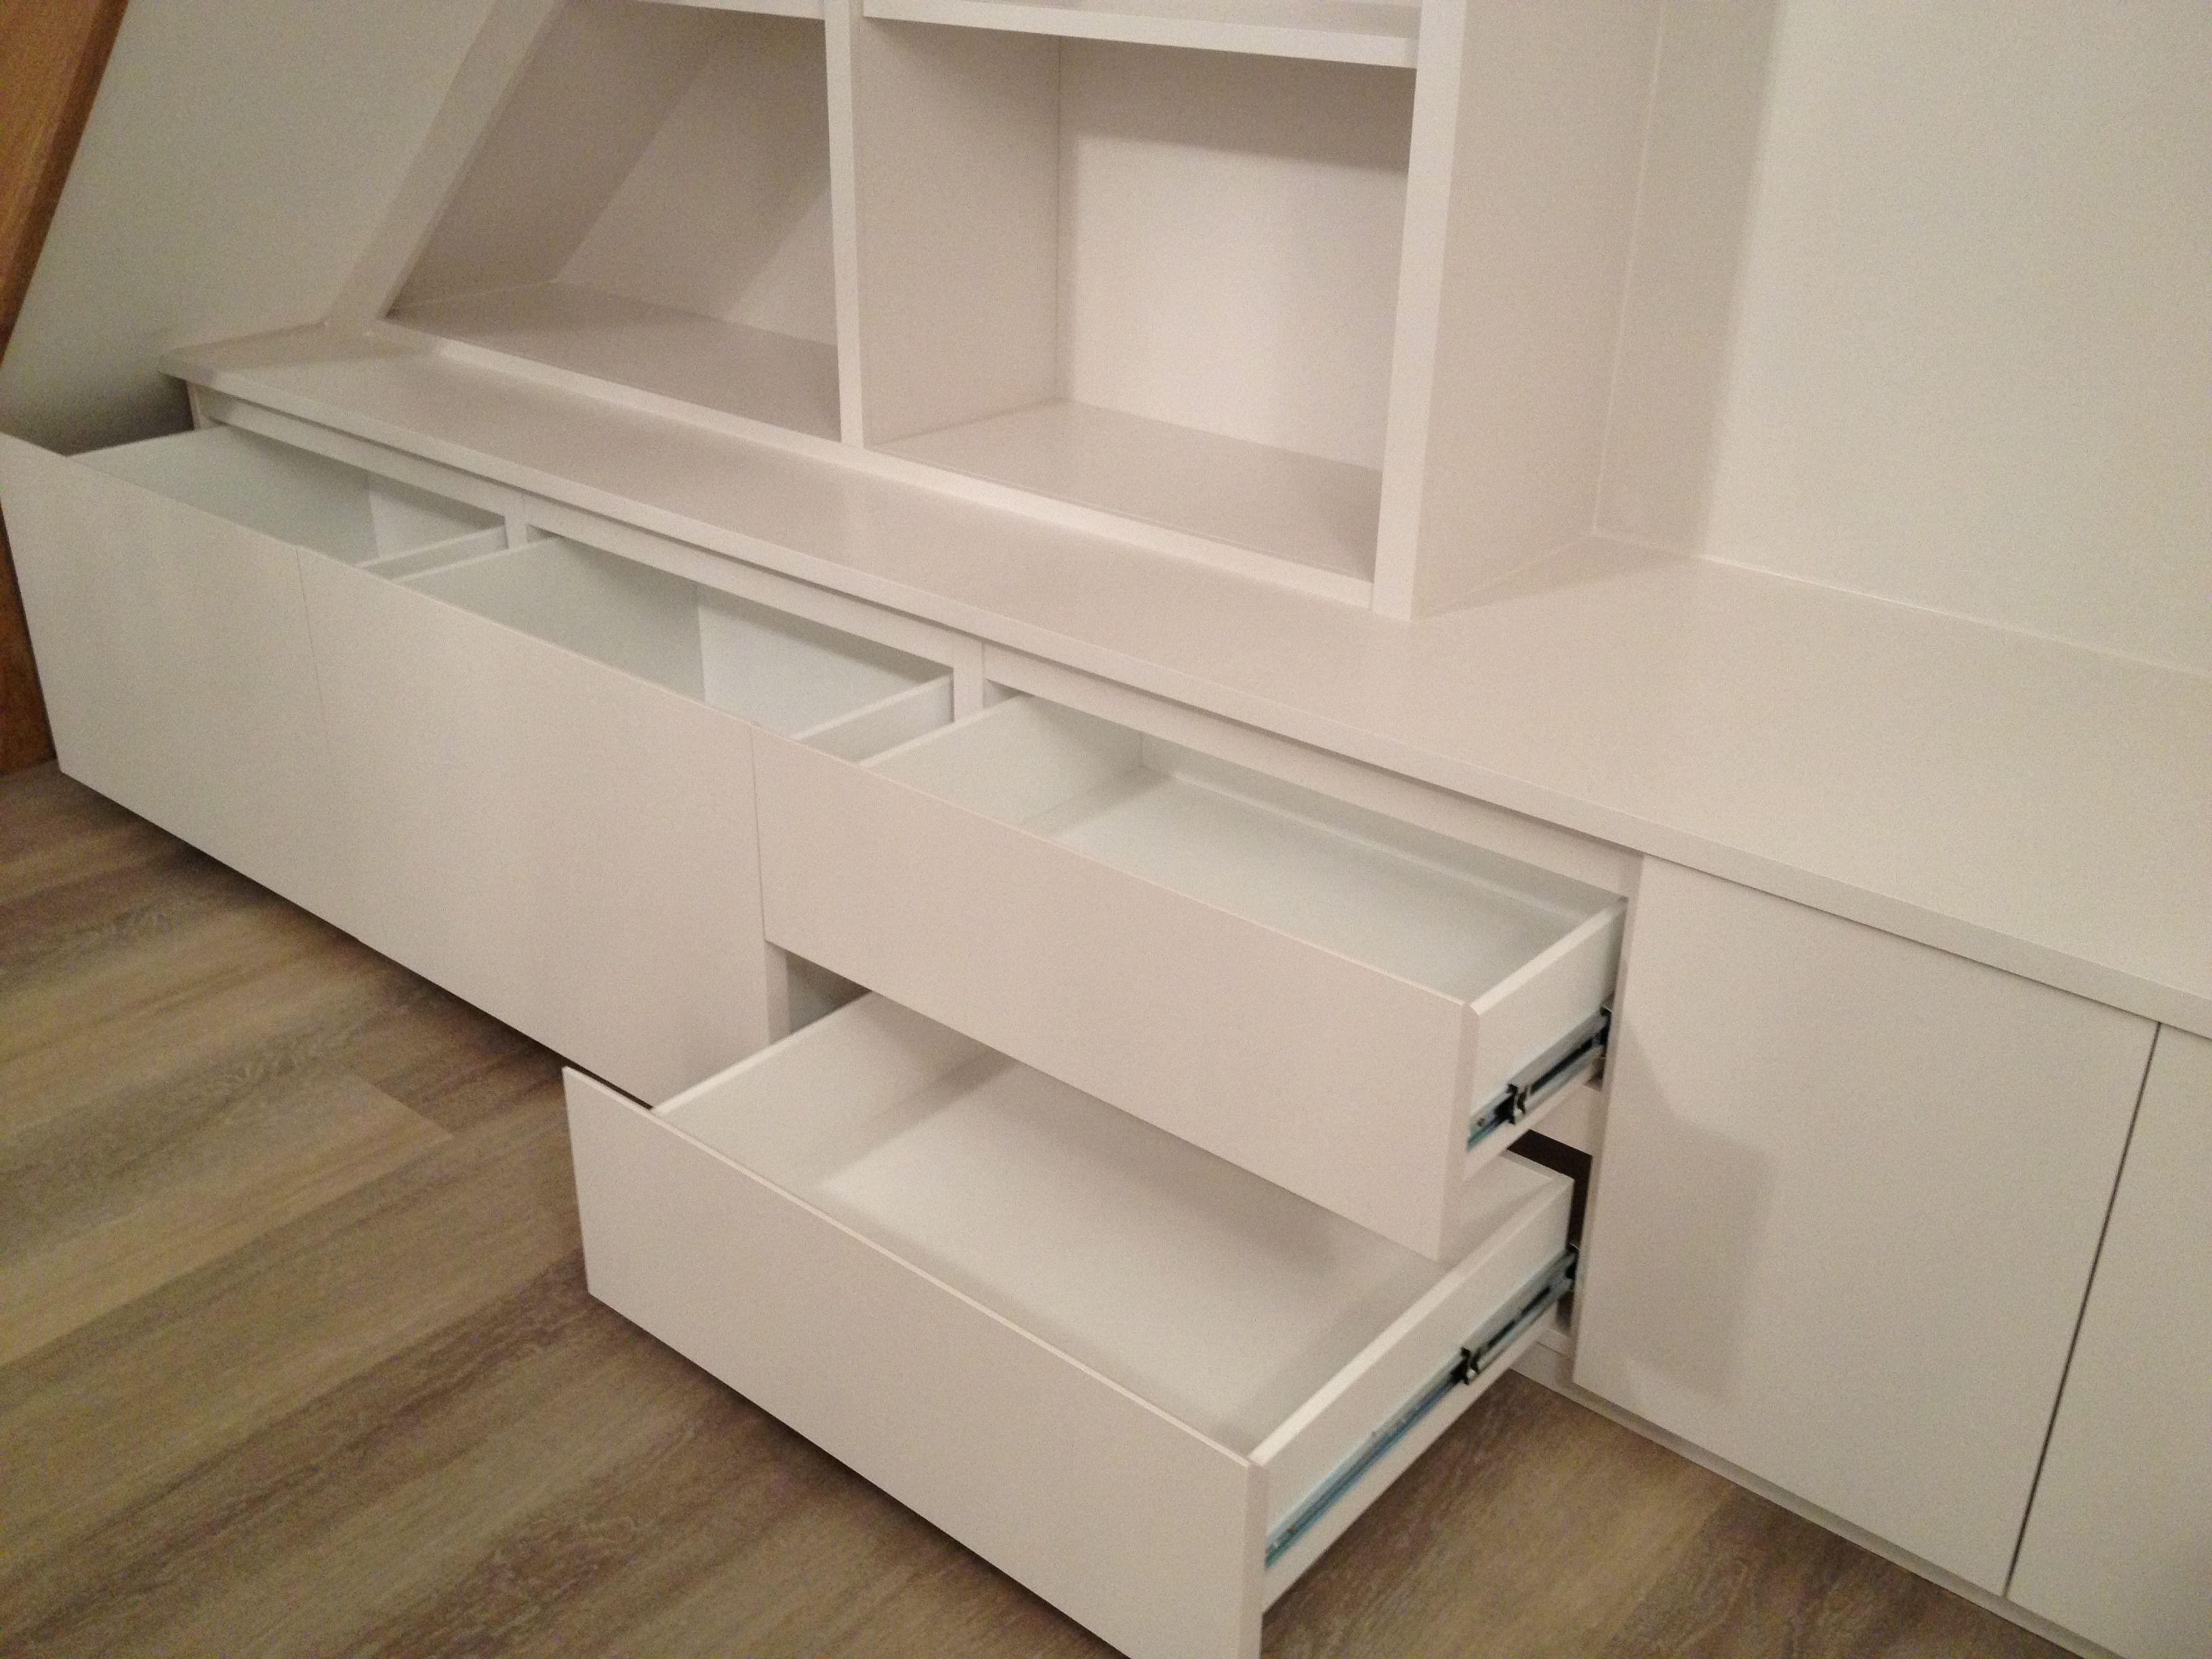 rustic living dvd cddvd furnishers storage high product oak drawers deans furniture rack cd bedside drawer dining